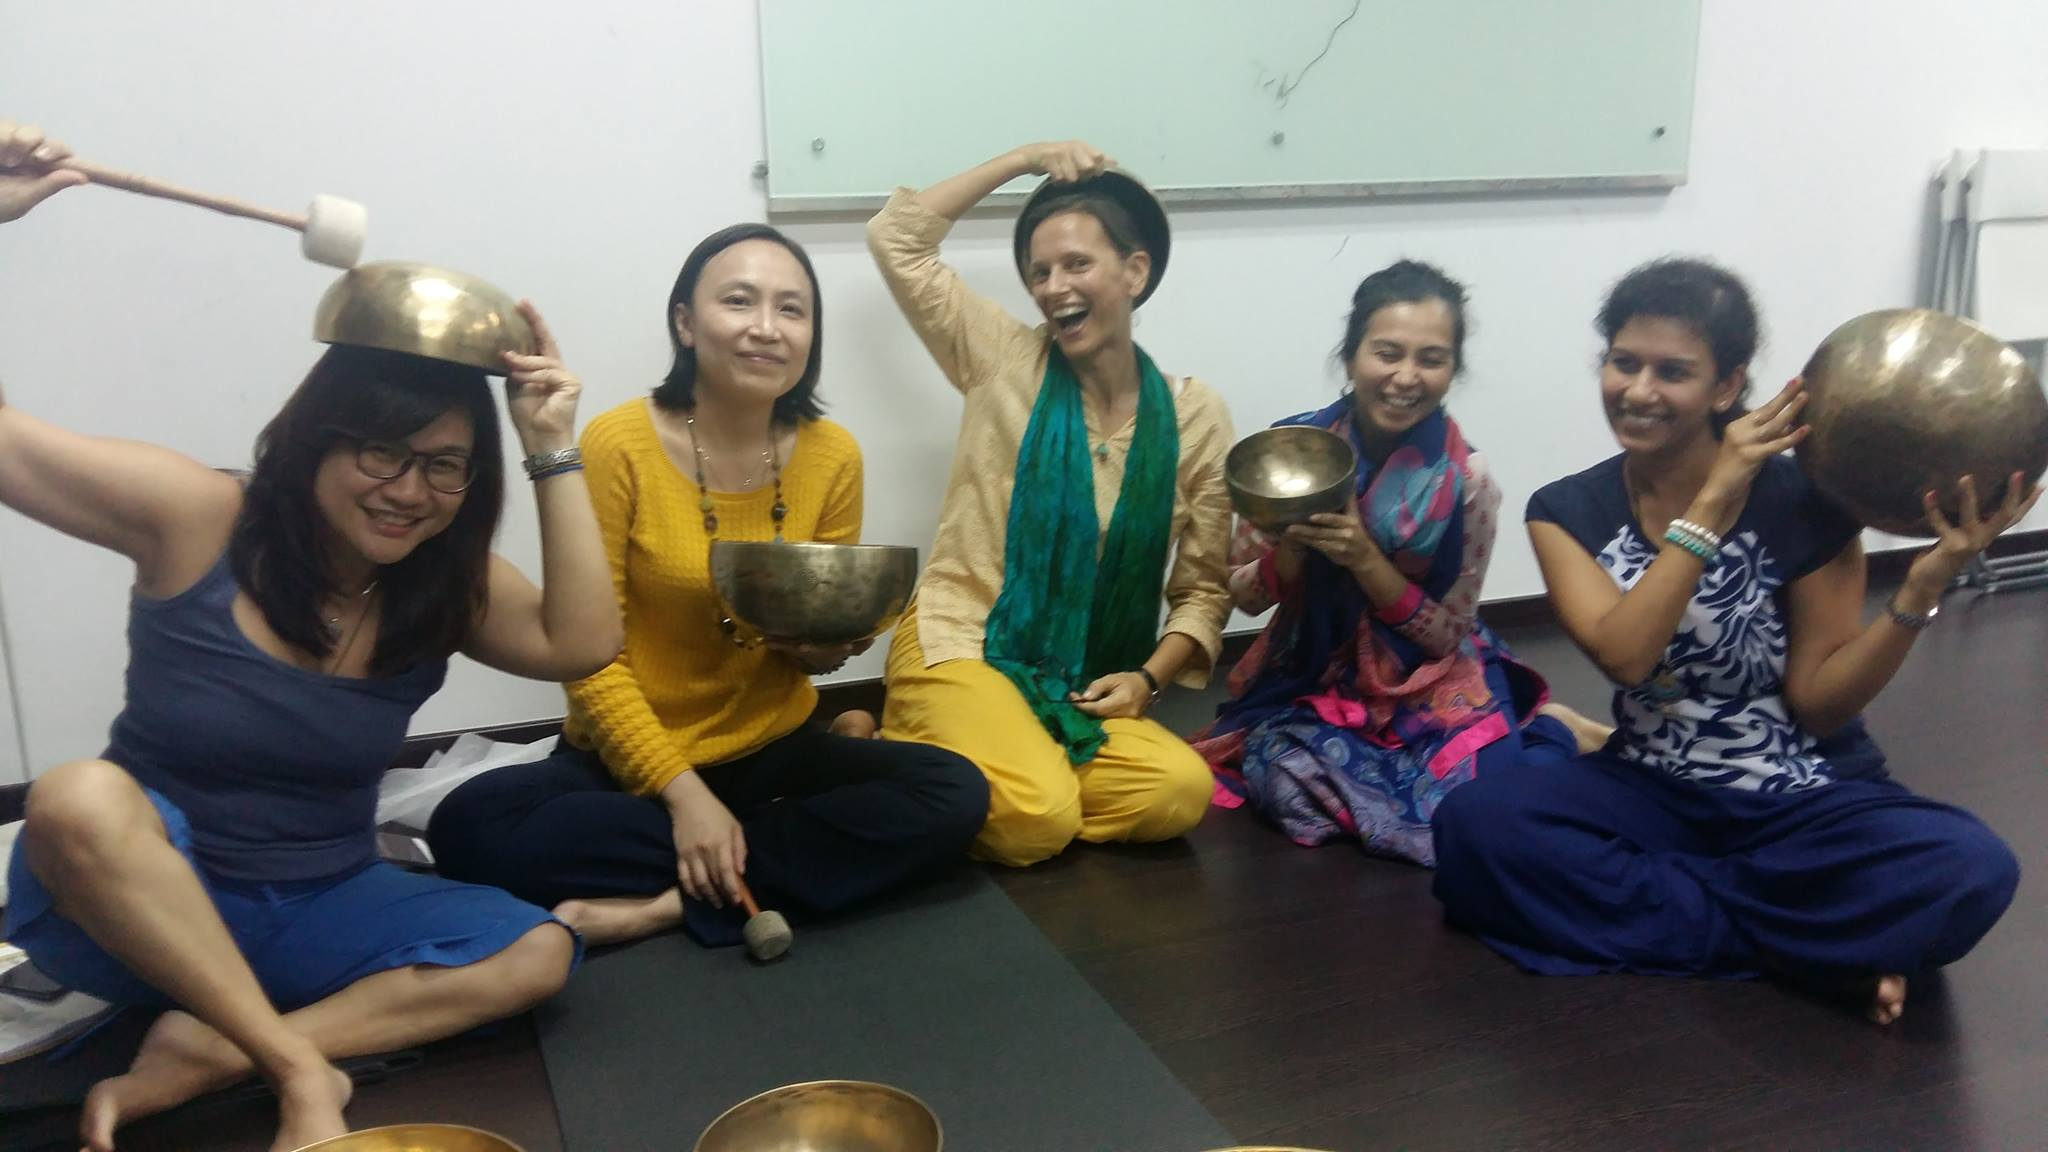 https://creativeyatra.com/wp-content/uploads/2017/10/Sound-Practitioner-Certification-with-Singing-Bowls-Ahmedabad.jpg